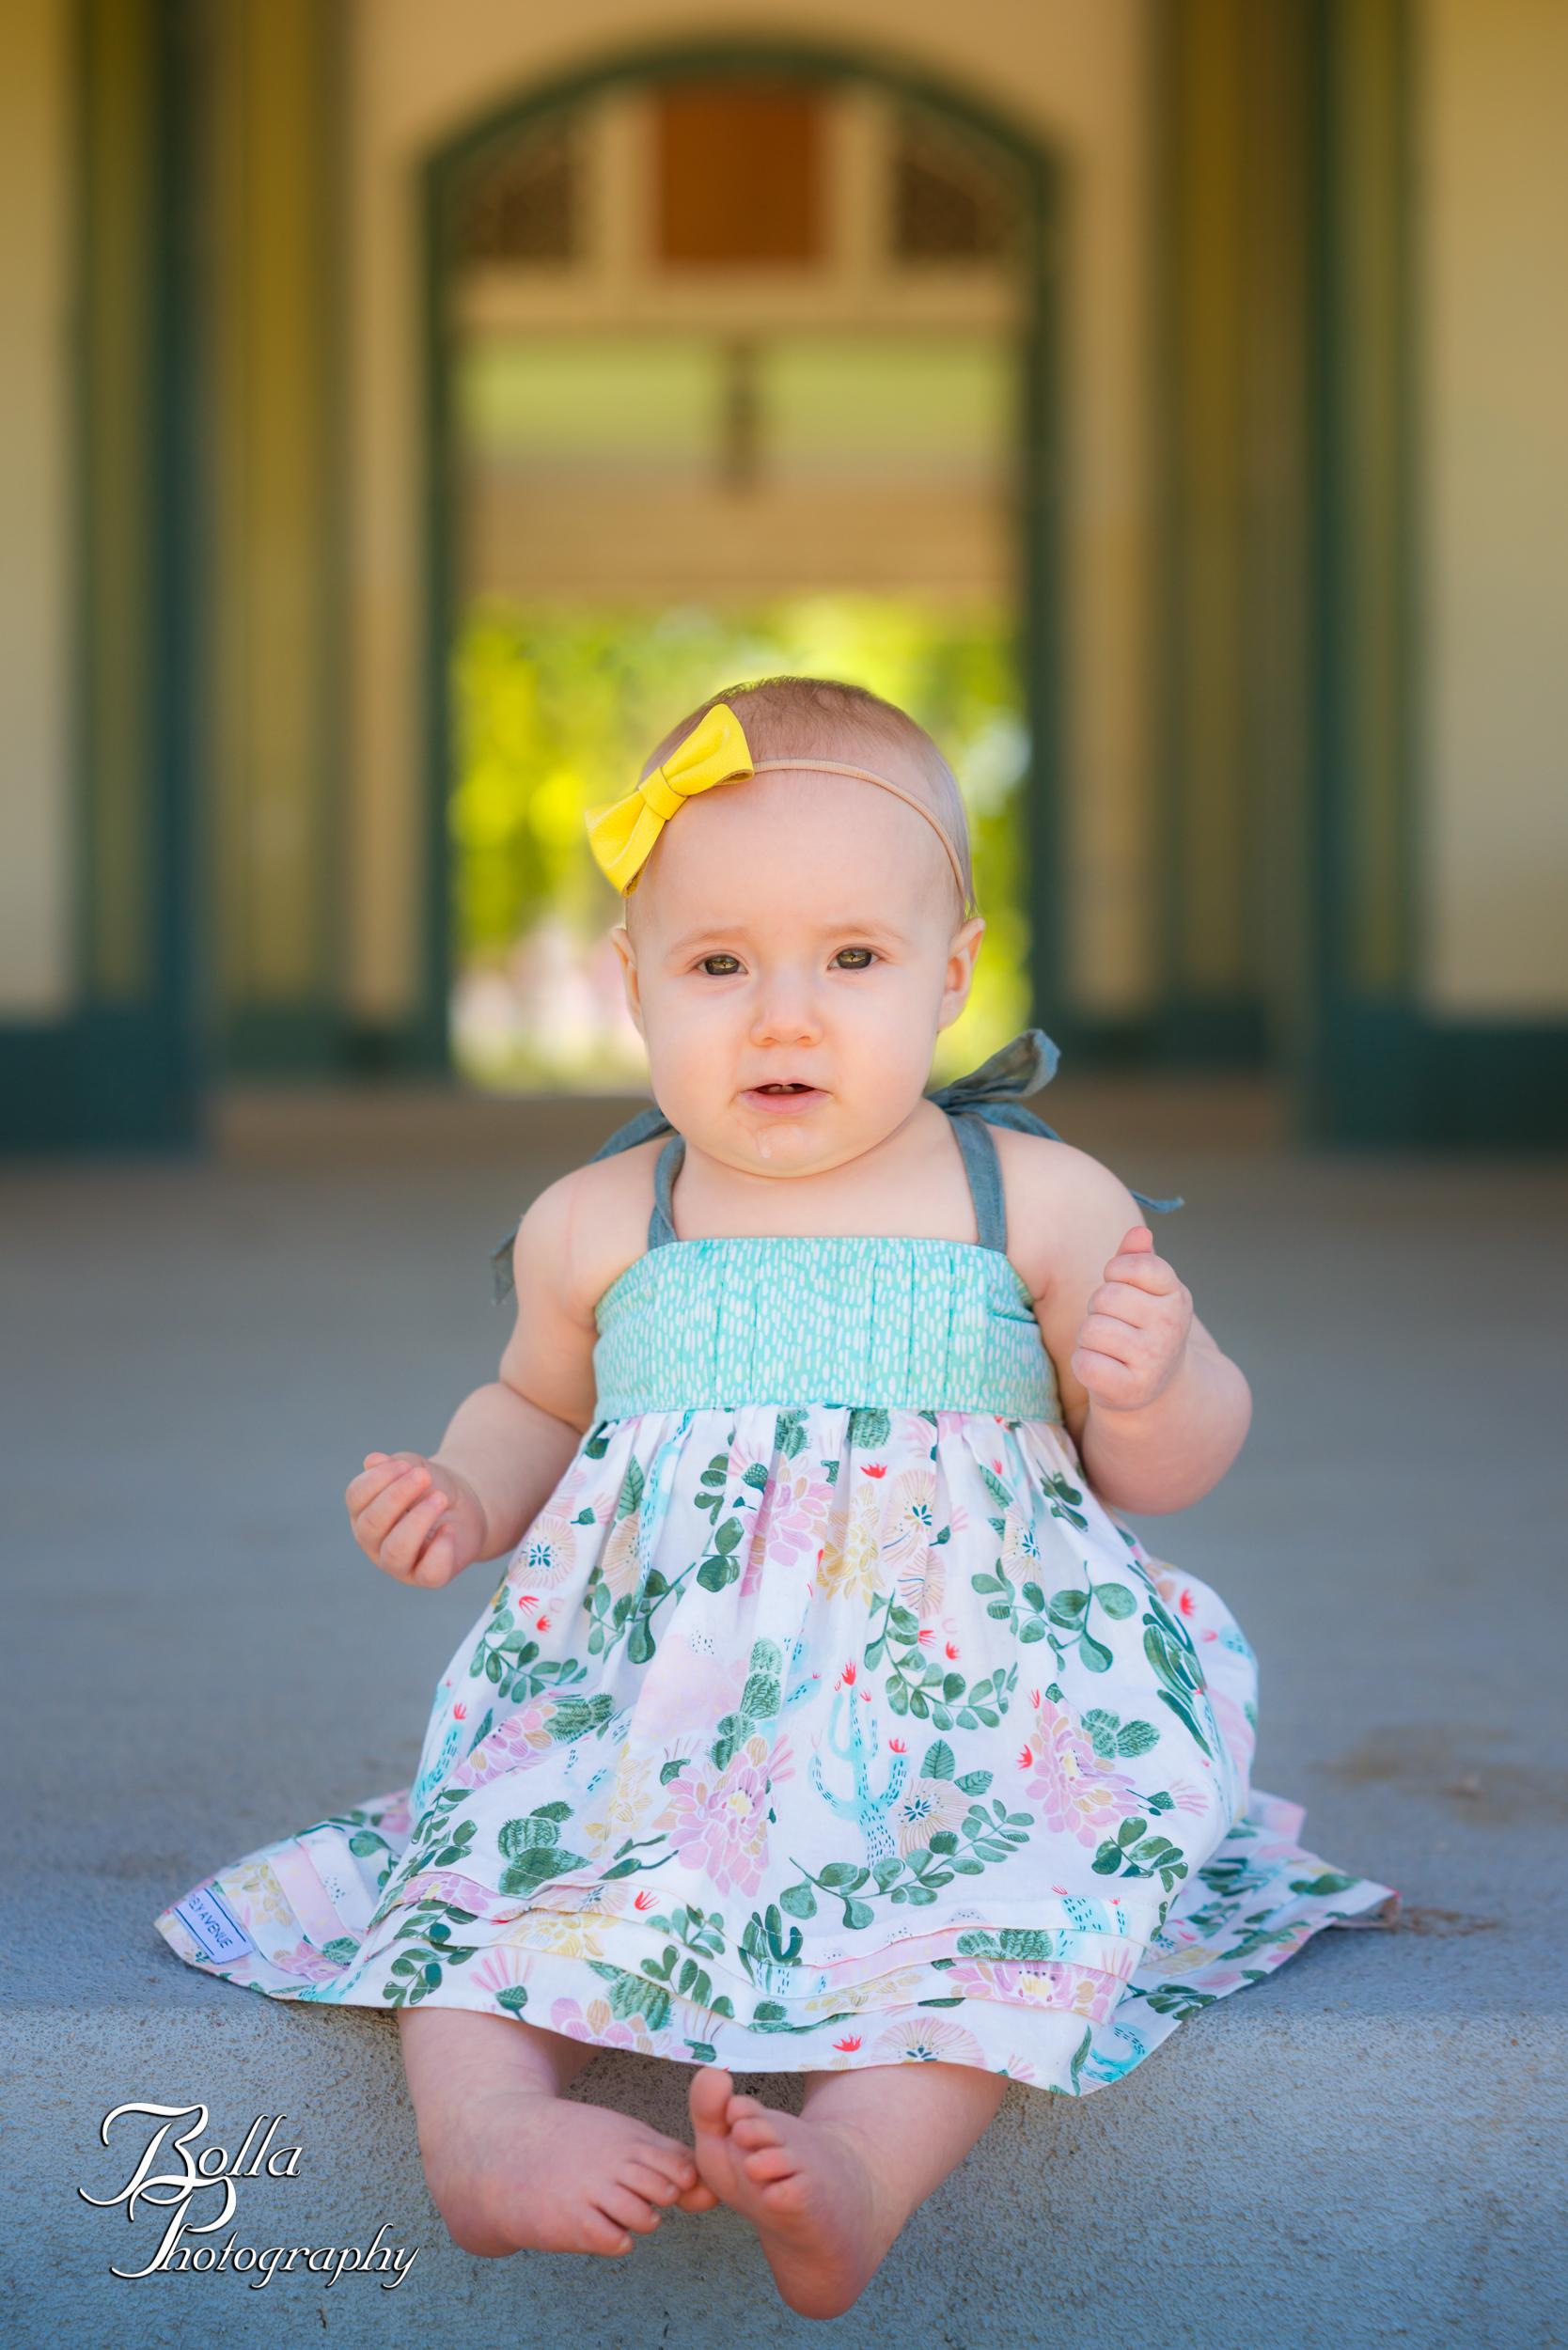 20170423_Bolla photography edwardsville wedding newborn baby photographer st louis weddings babies-0002.jpg